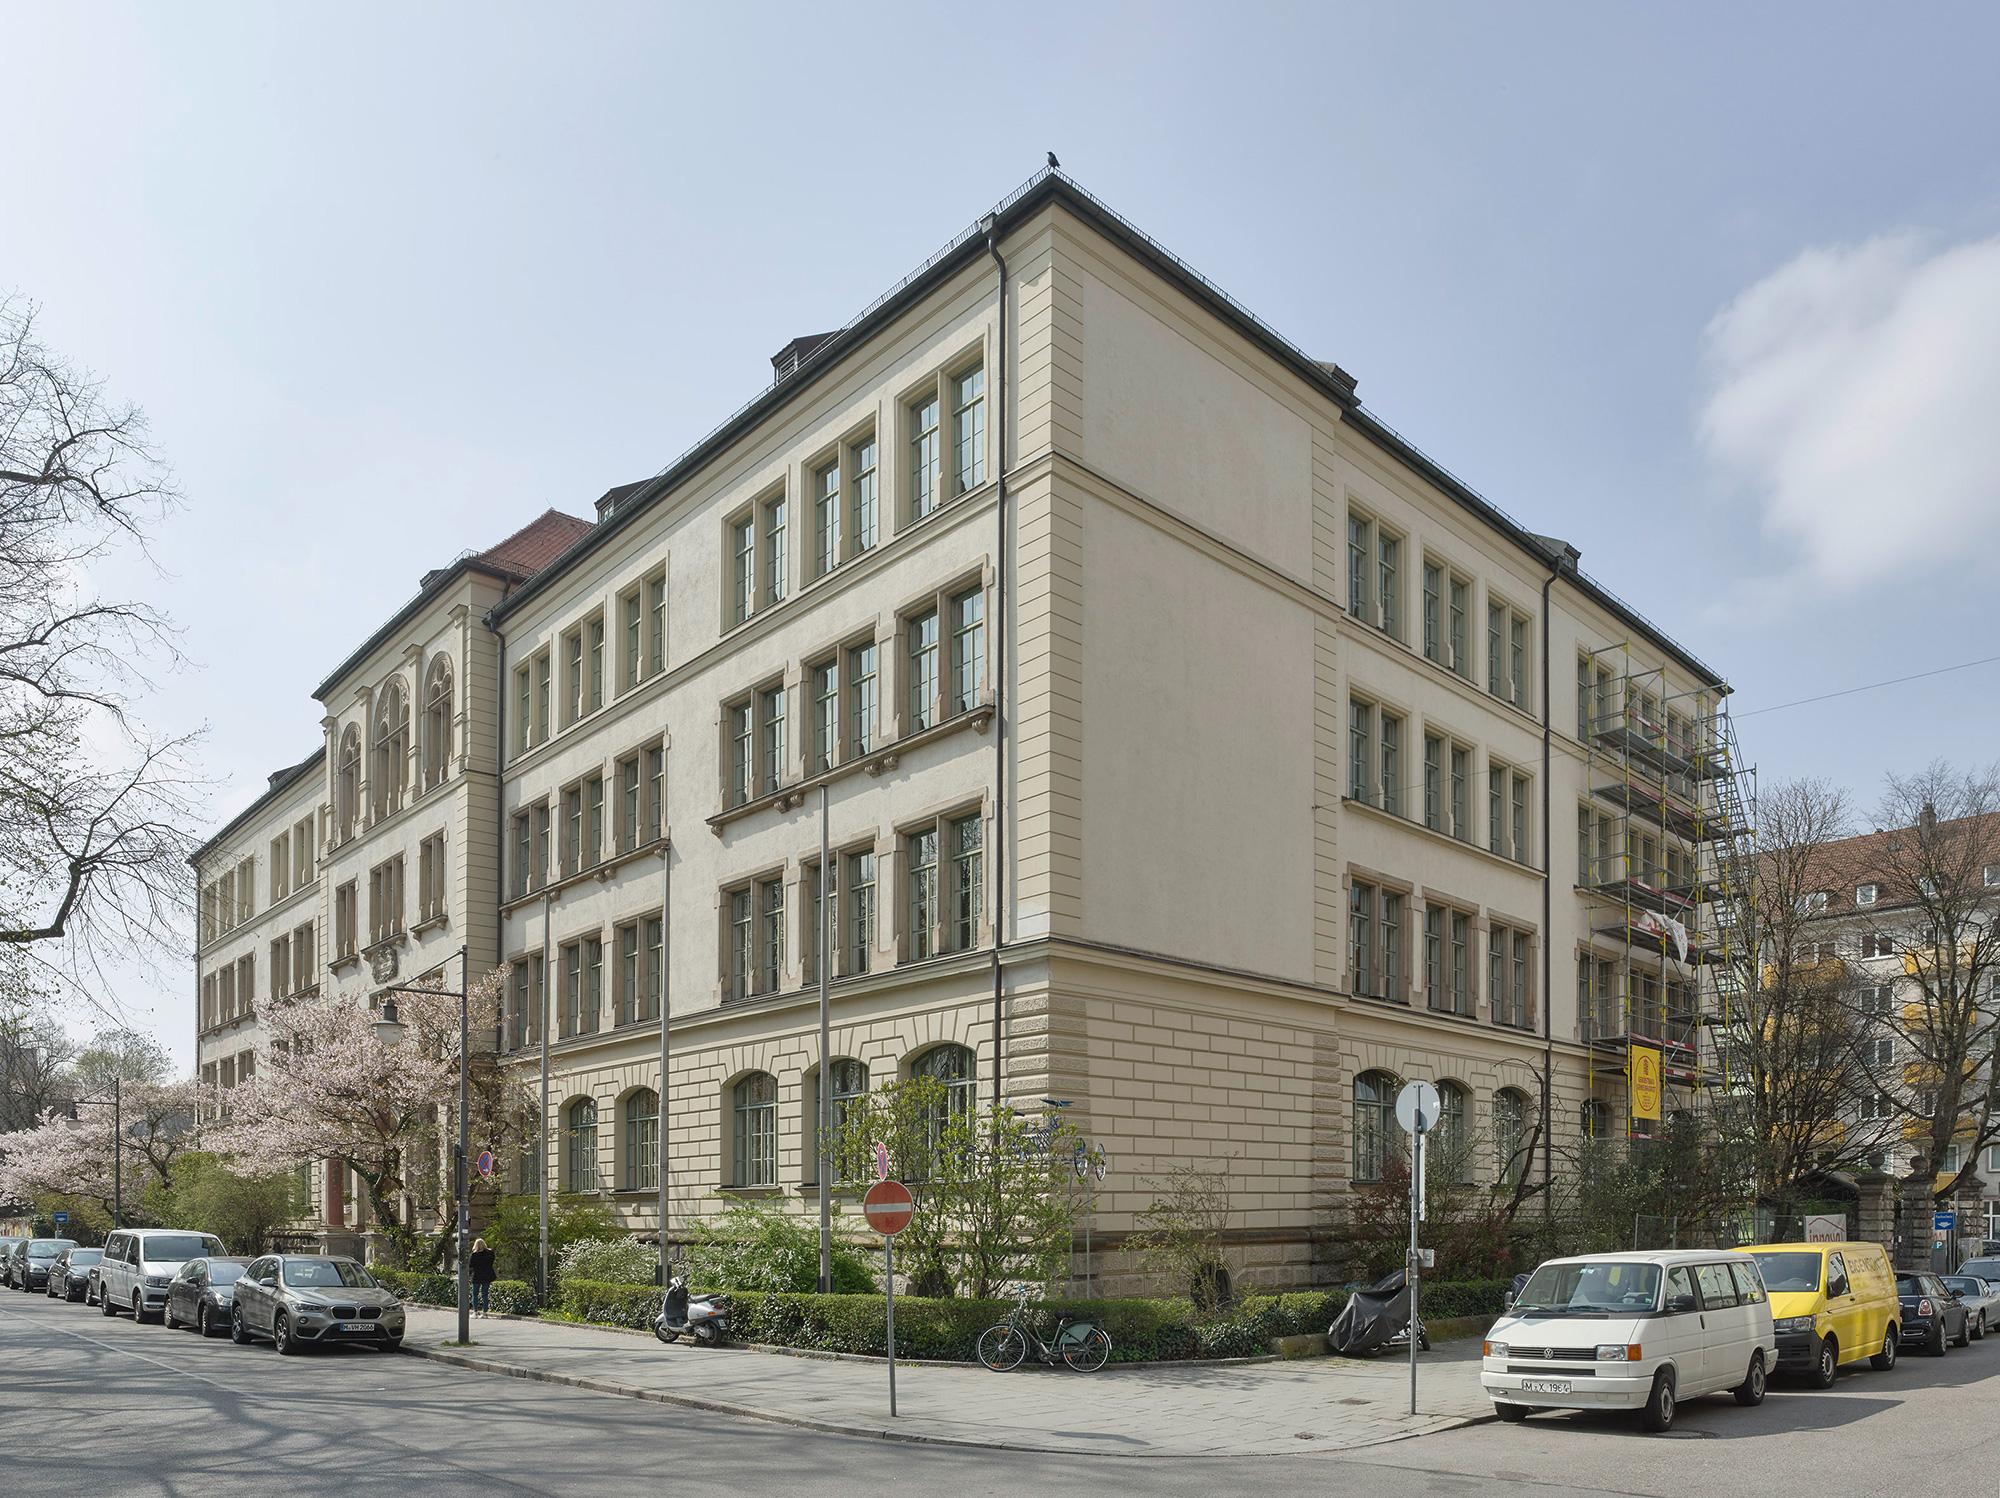 haushofer wittelsbacherschule muenchen